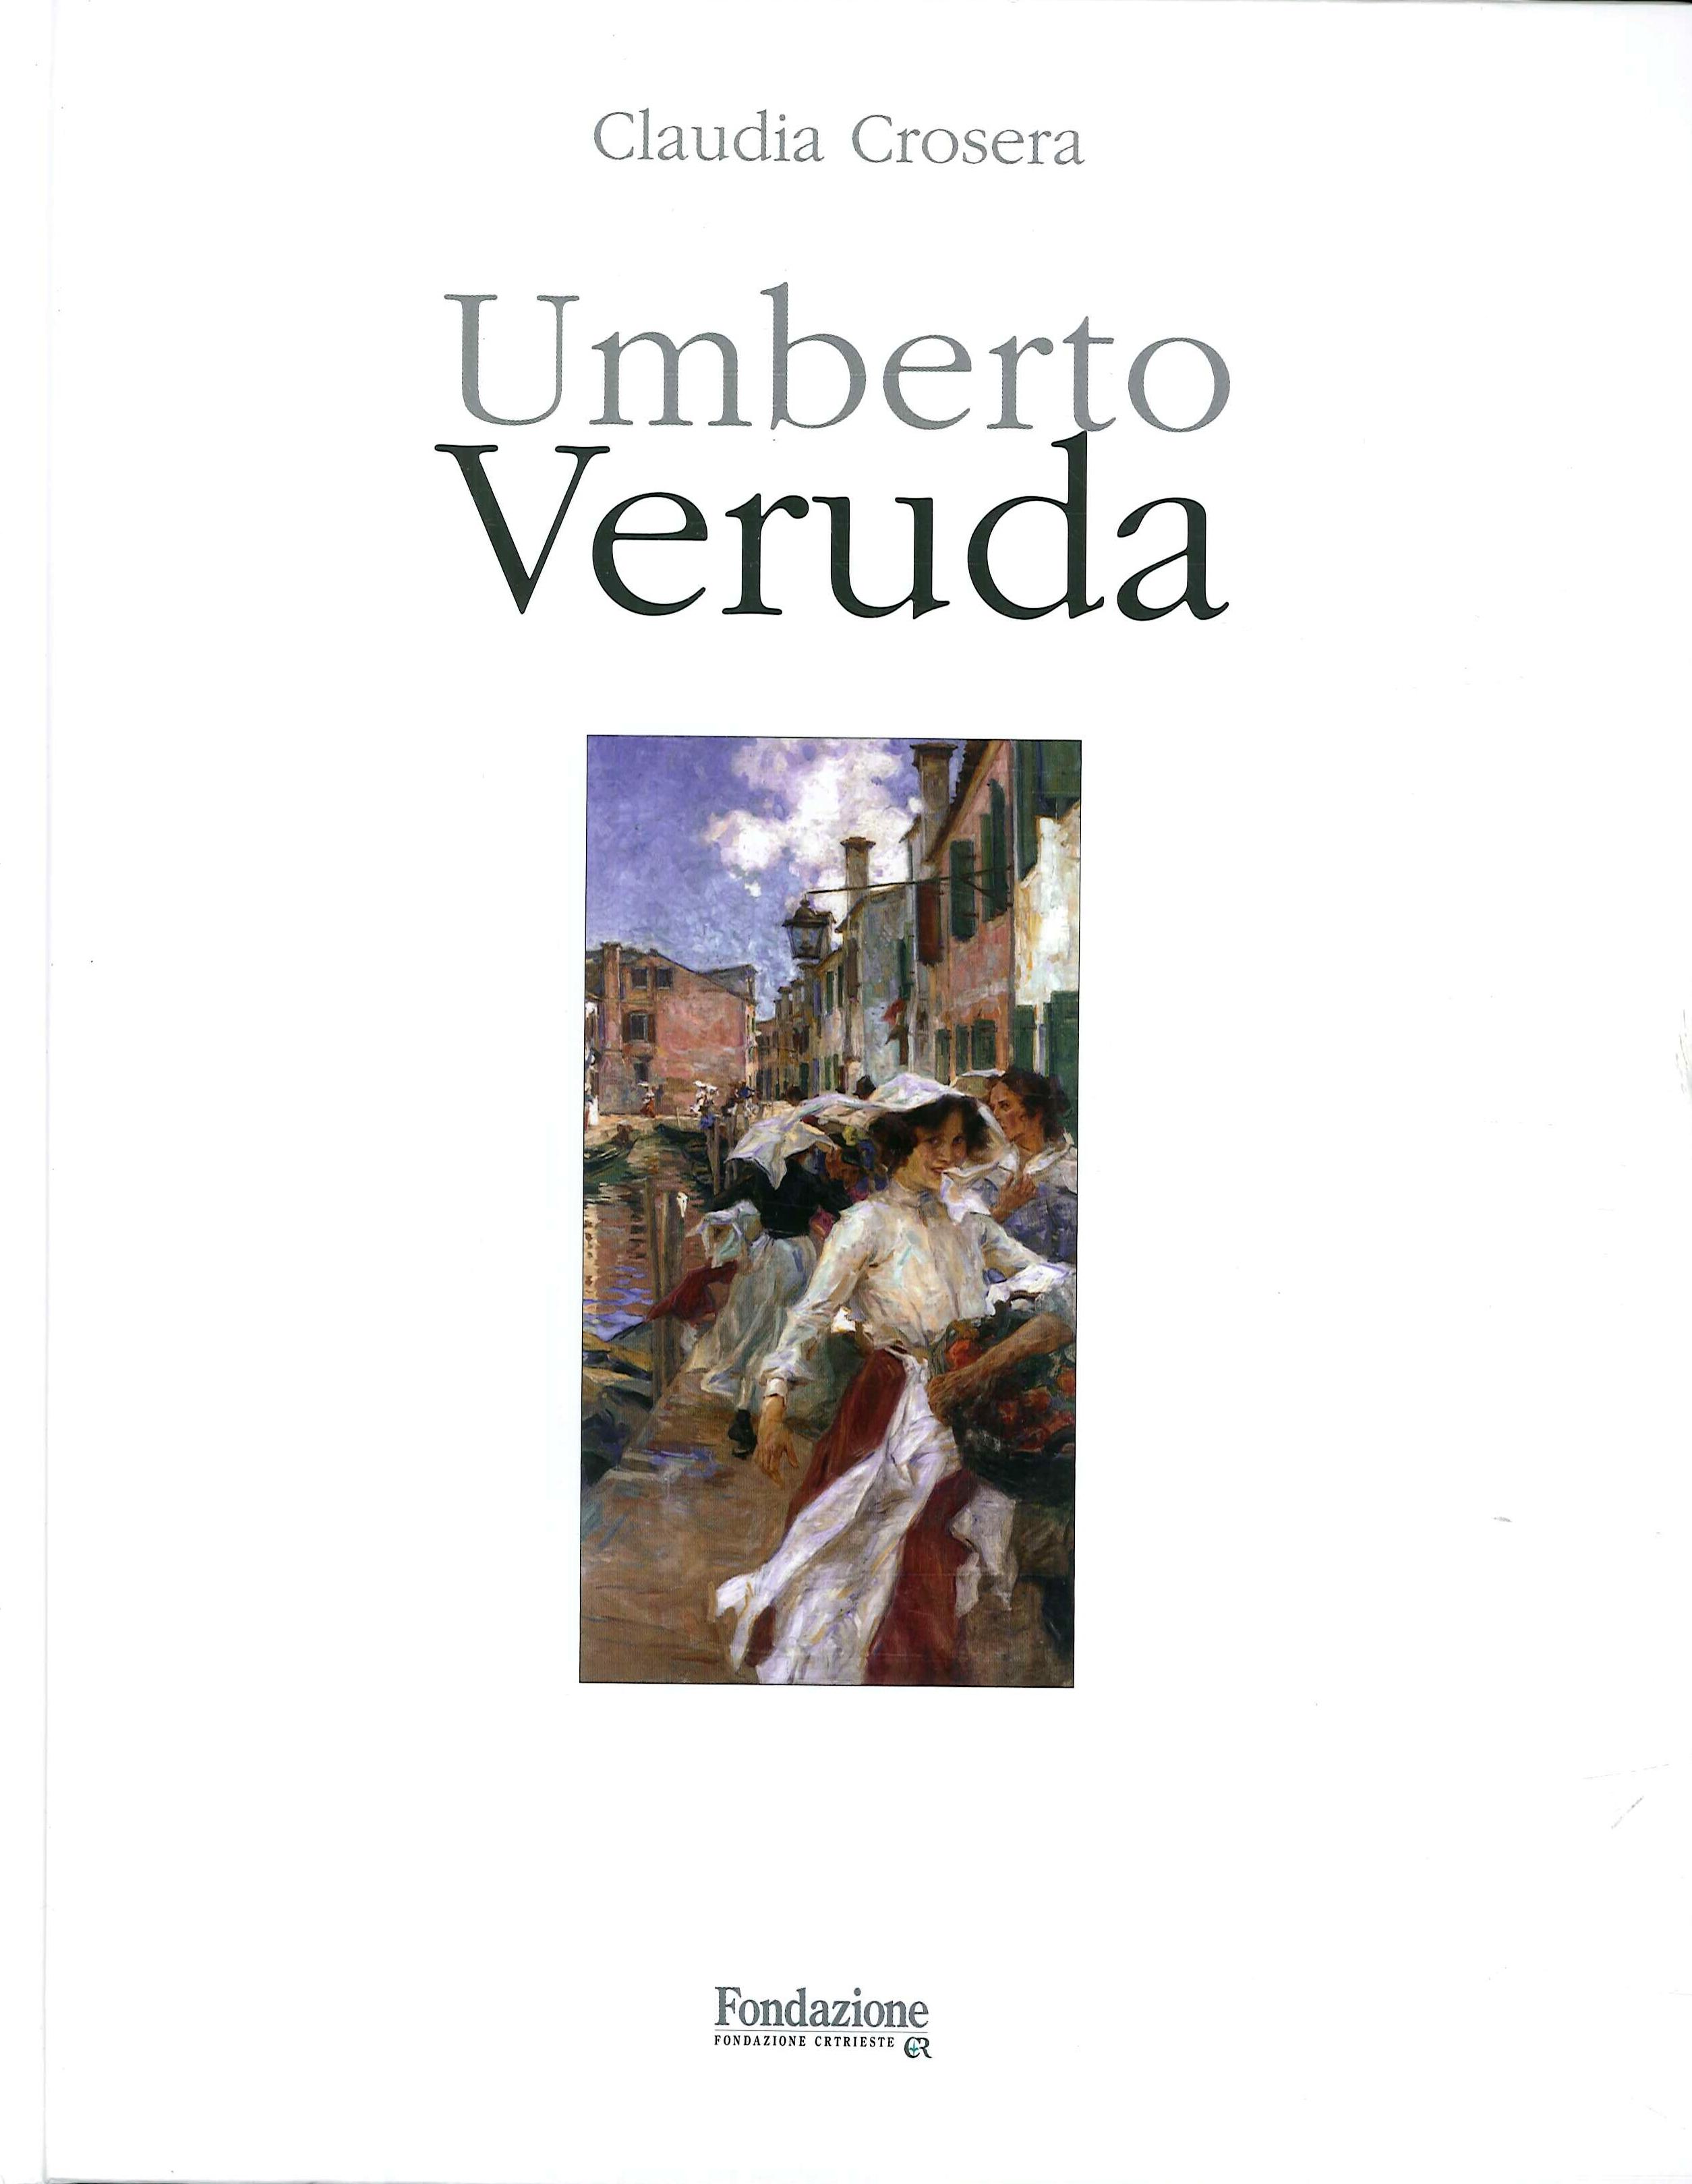 Umberto Veruda